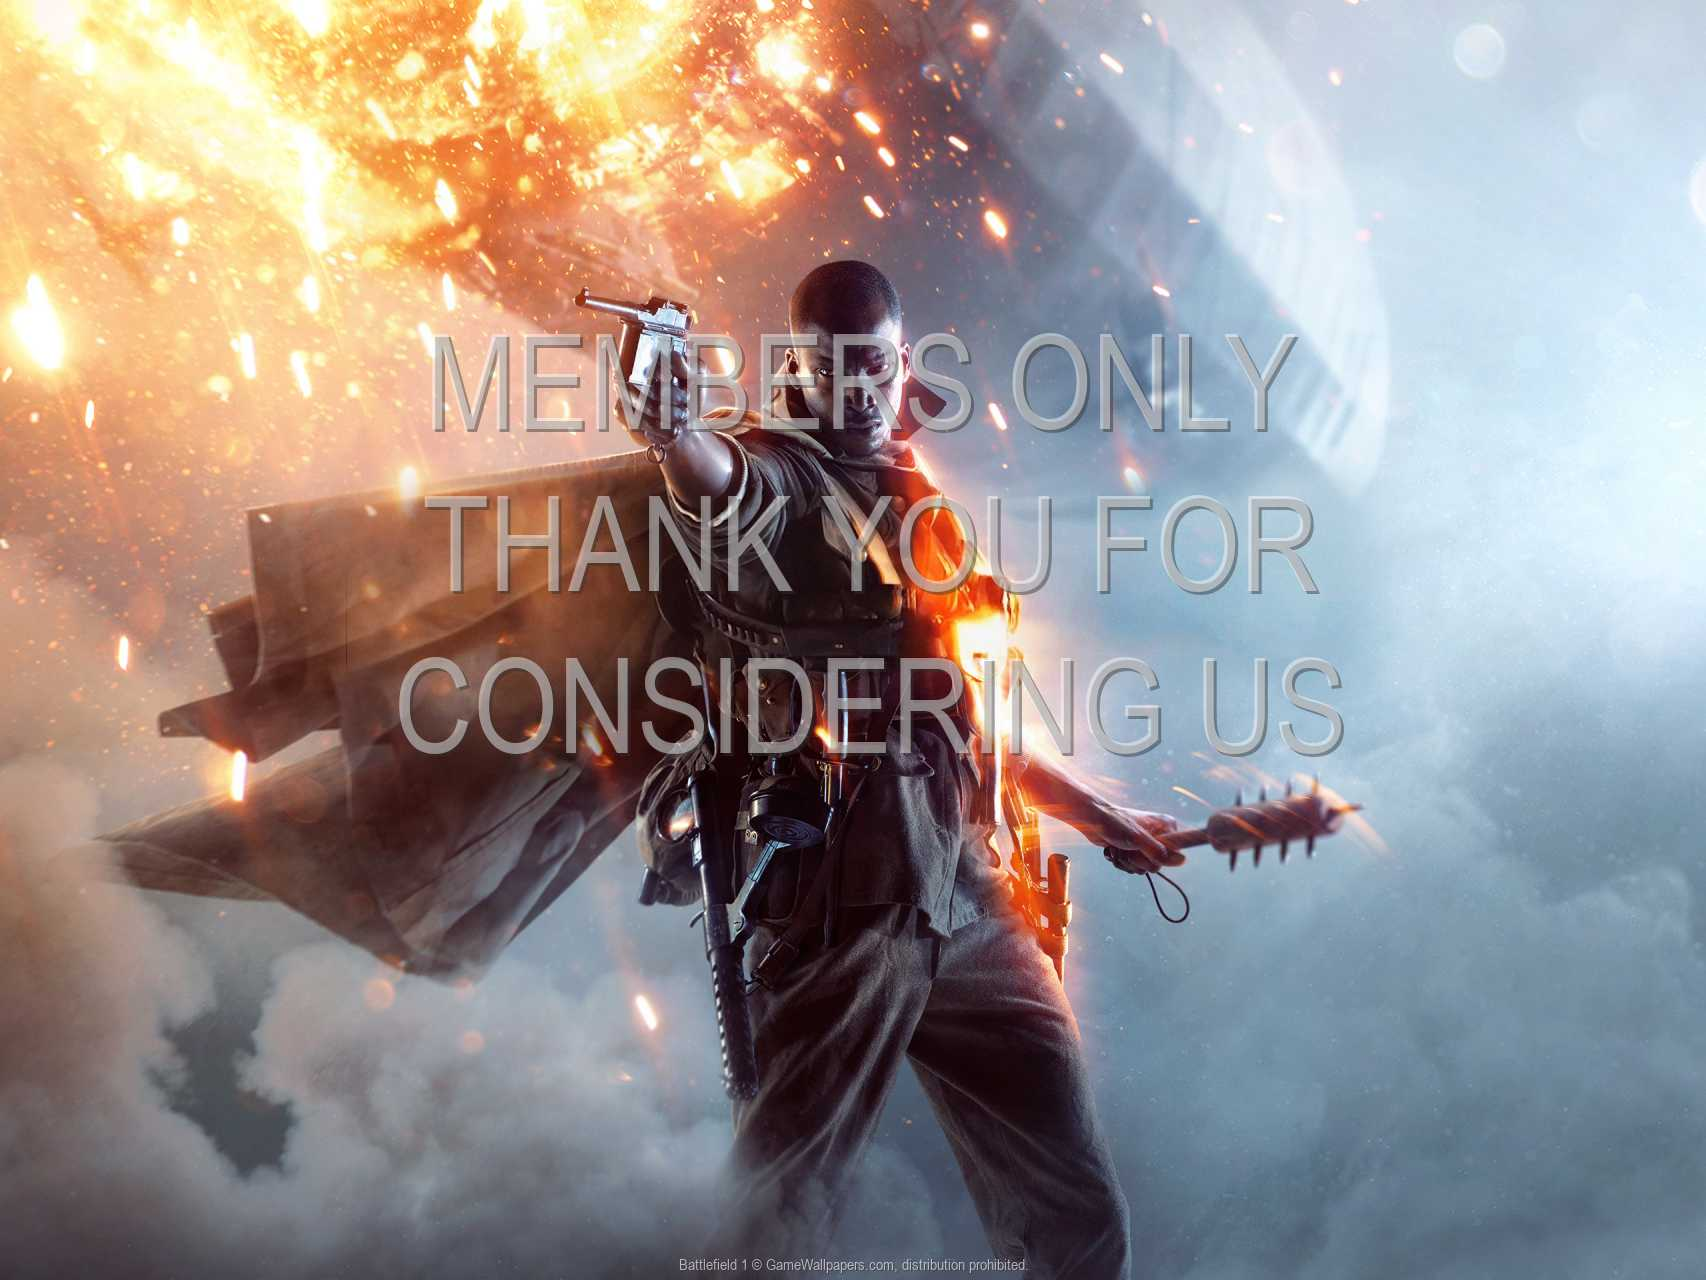 Battlefield 1 720p Horizontal Mobile wallpaper or background 01